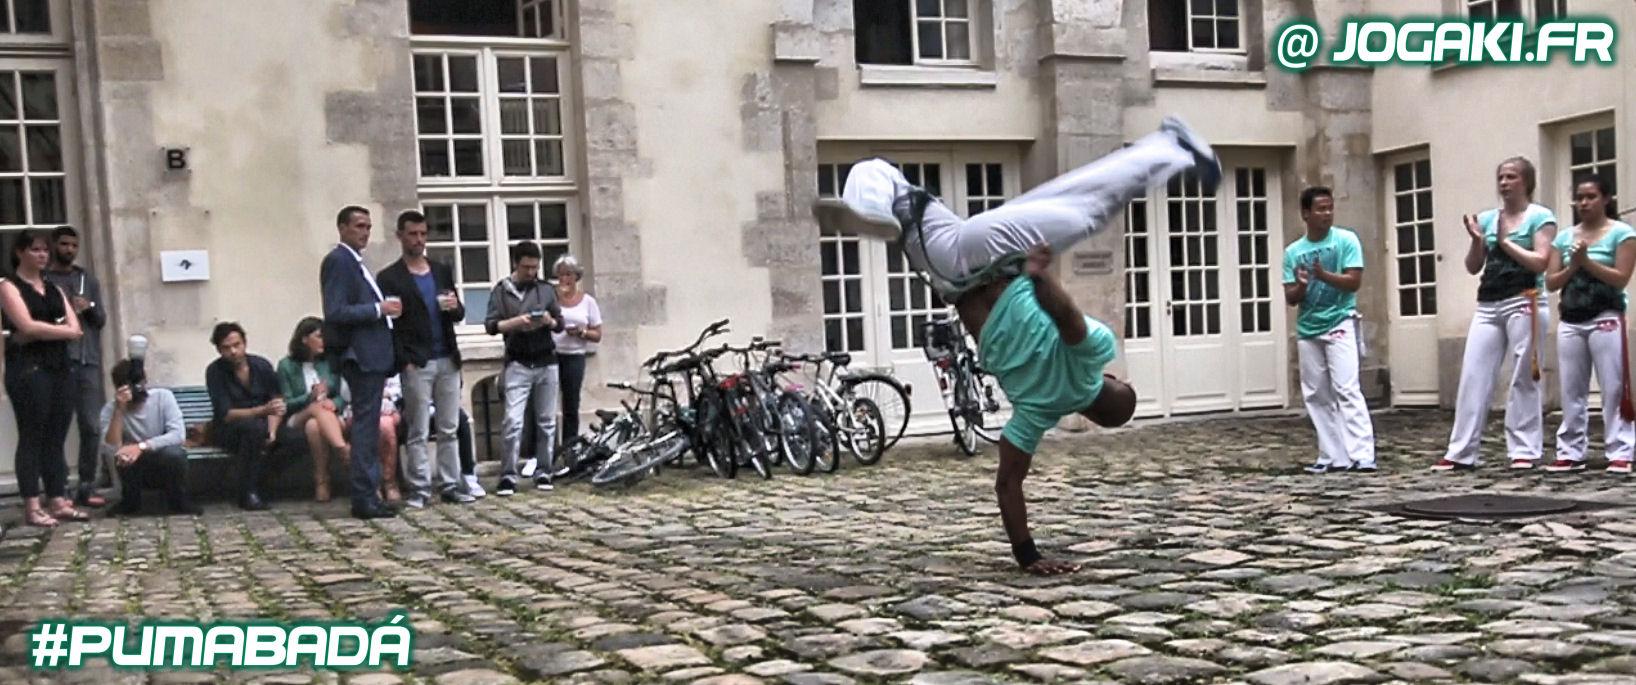 capoeira-paris-bamba-pumabada-jogaki-acrobaties